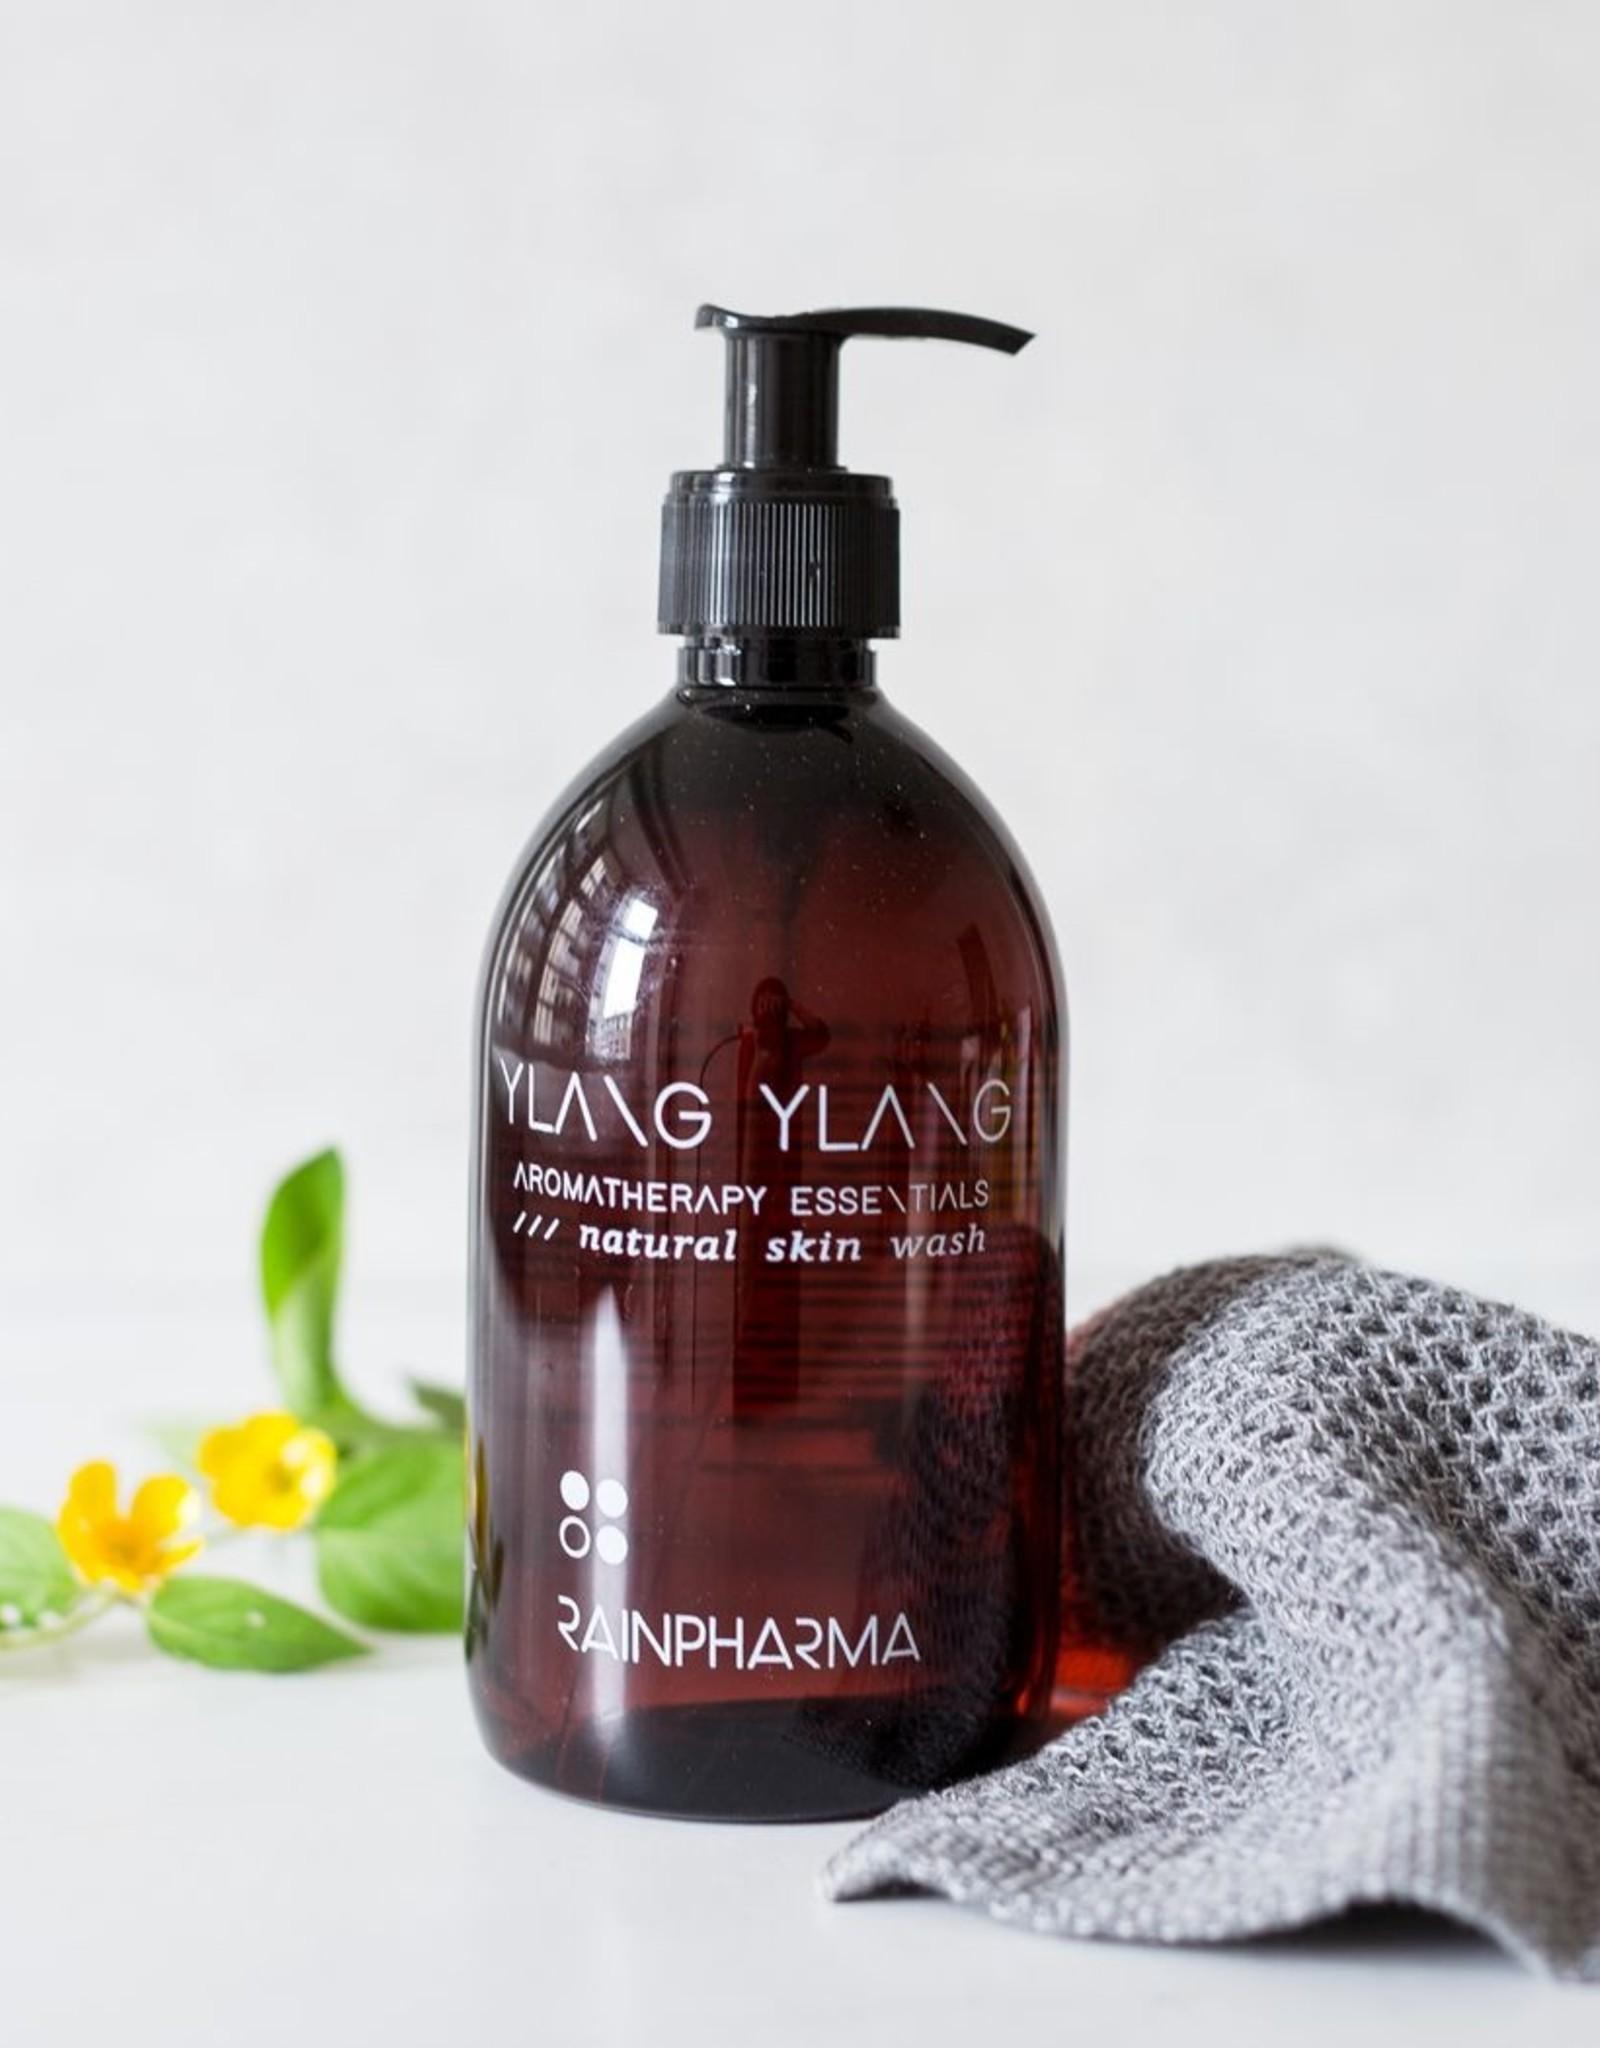 RainPharma Rainpharma - Skin Wash Ylang Ylang 500ml